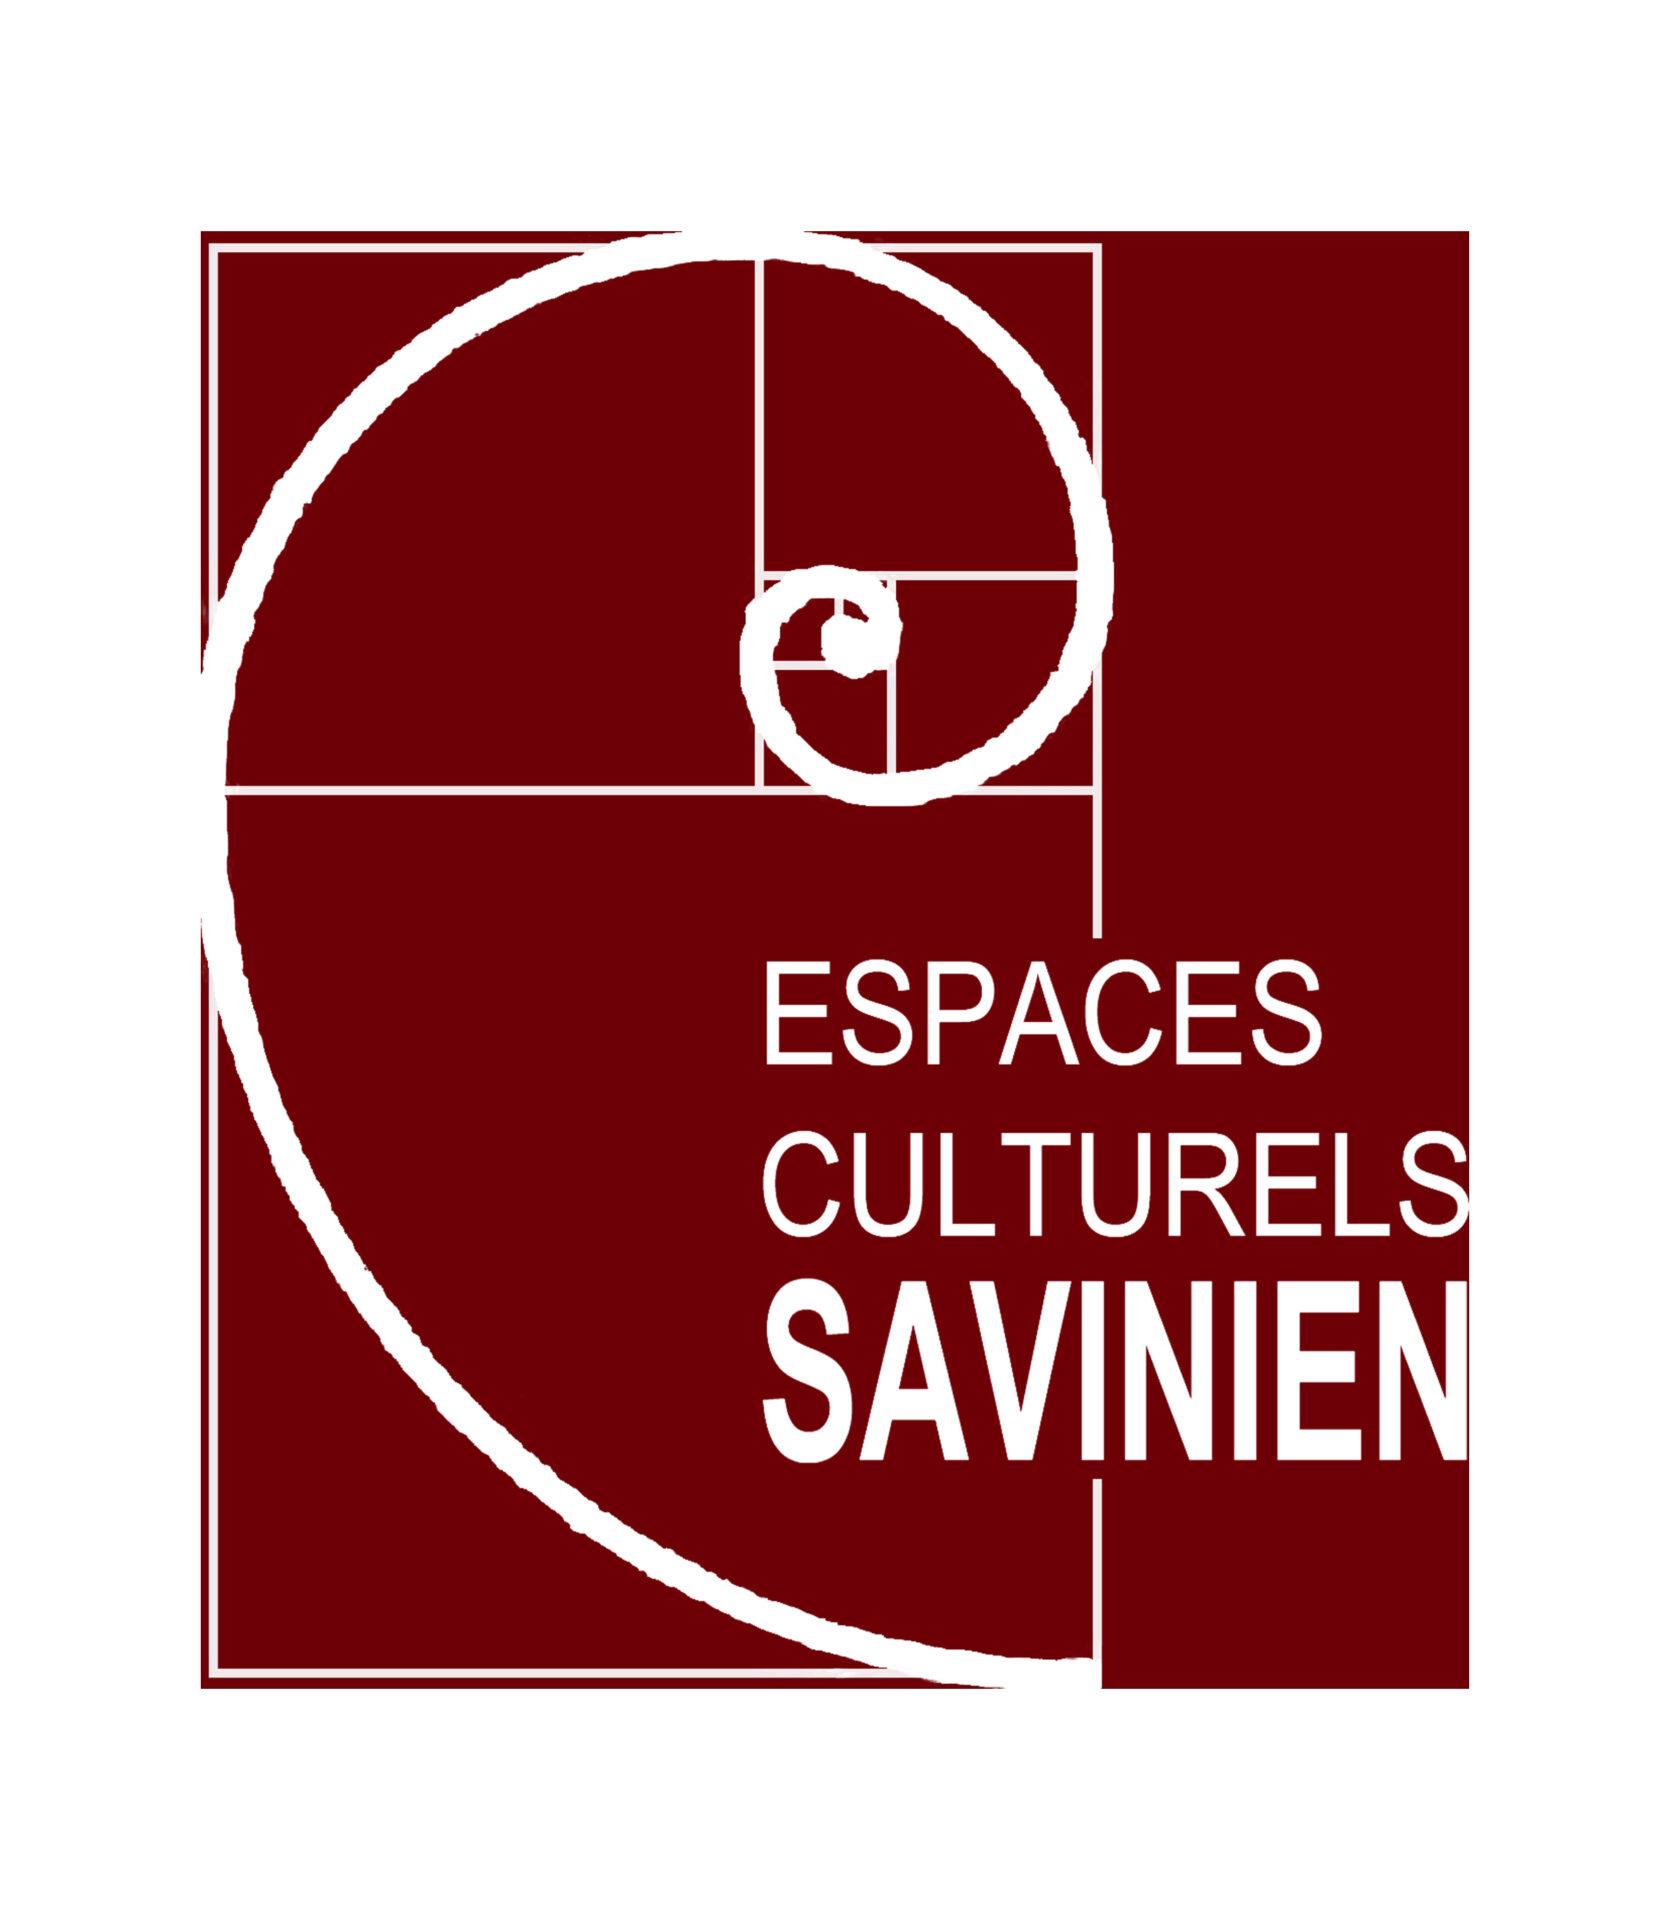 Espaces culturels Savinien